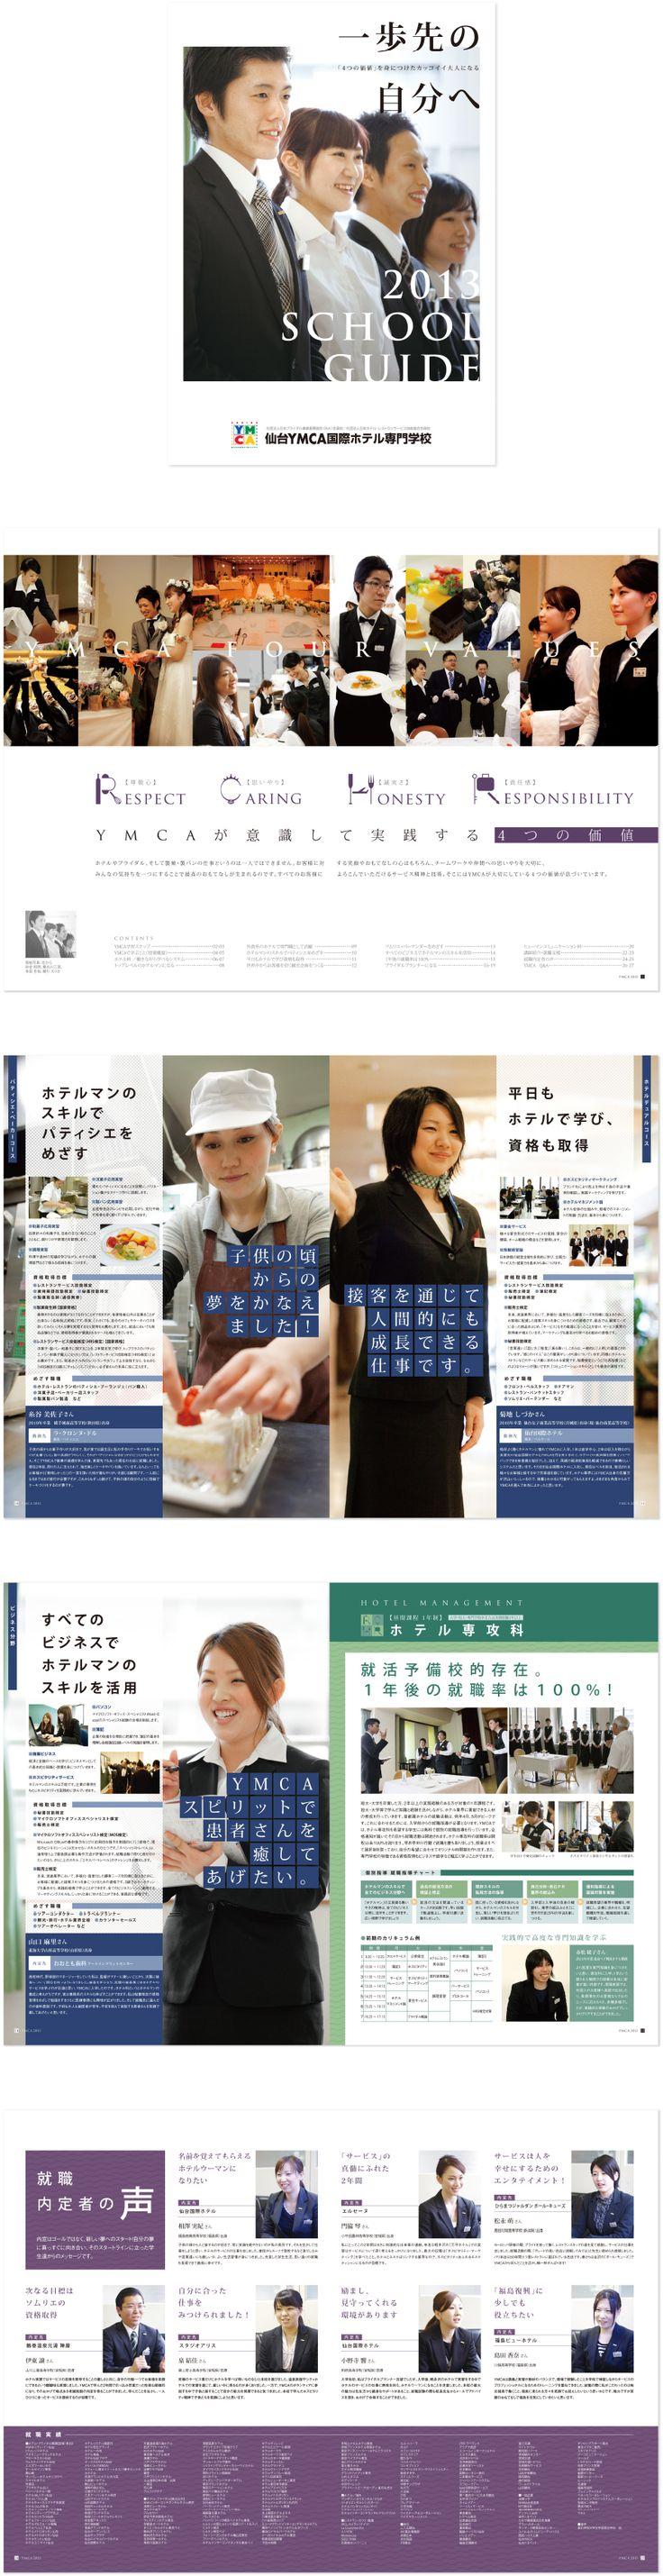 仙台YMCA国際ホテル専門学校2012